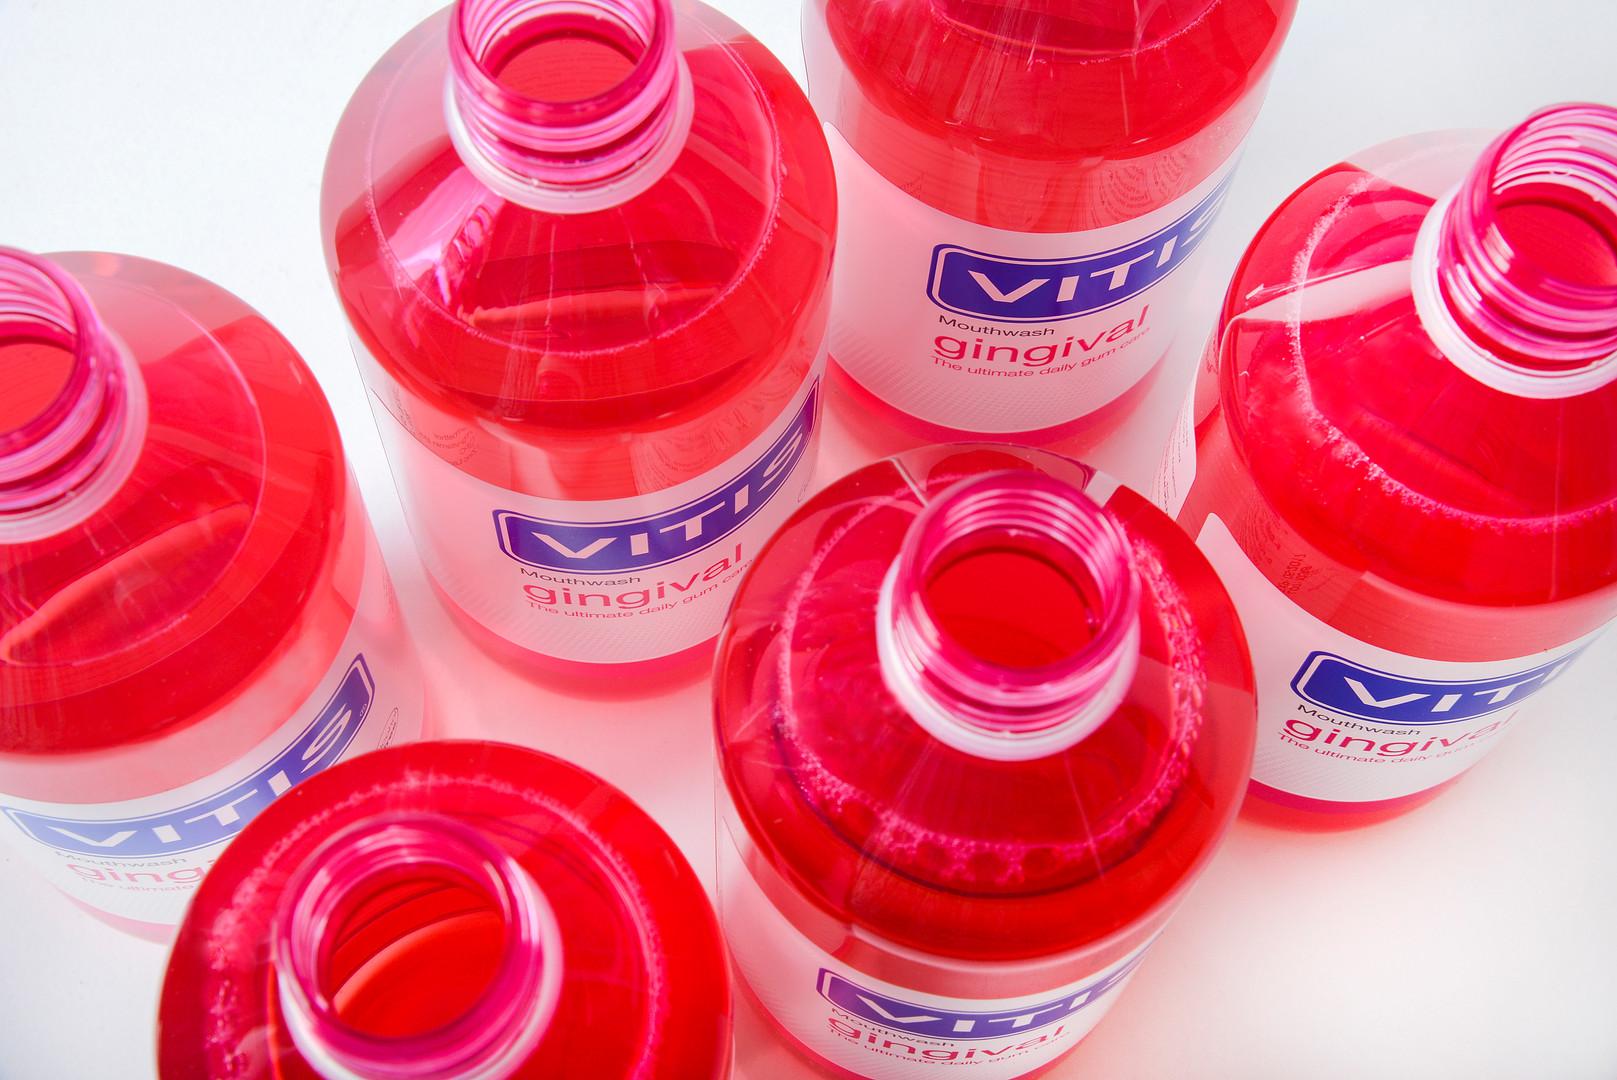 Vitis gingival mouthwash.jpg